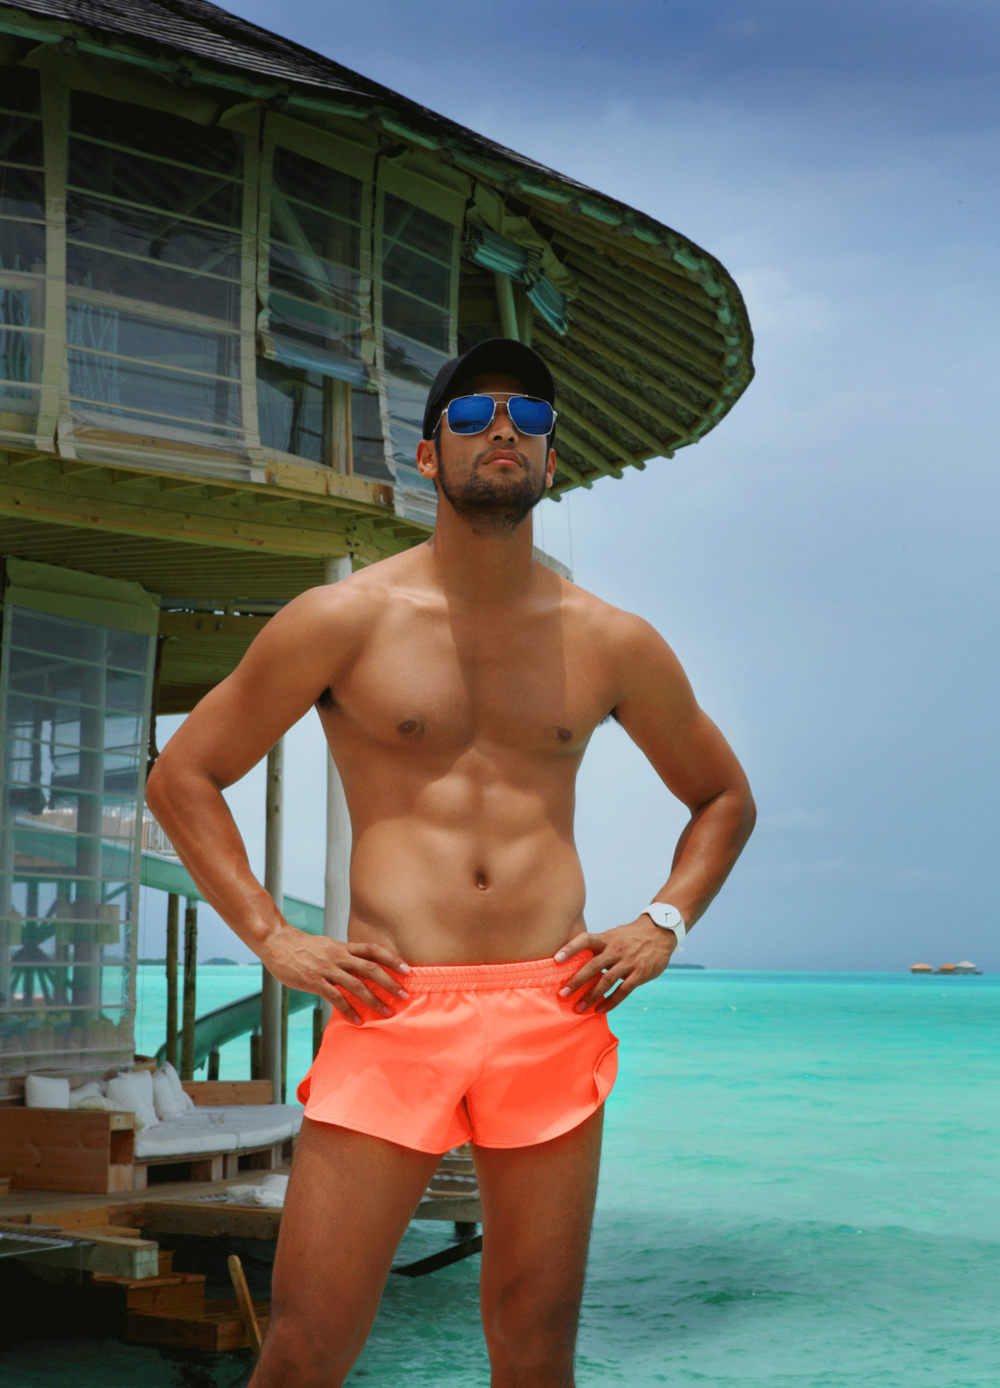 shorts : SARIT / sunglasses : TAVAT / watch : SWATCH SKINCLASS